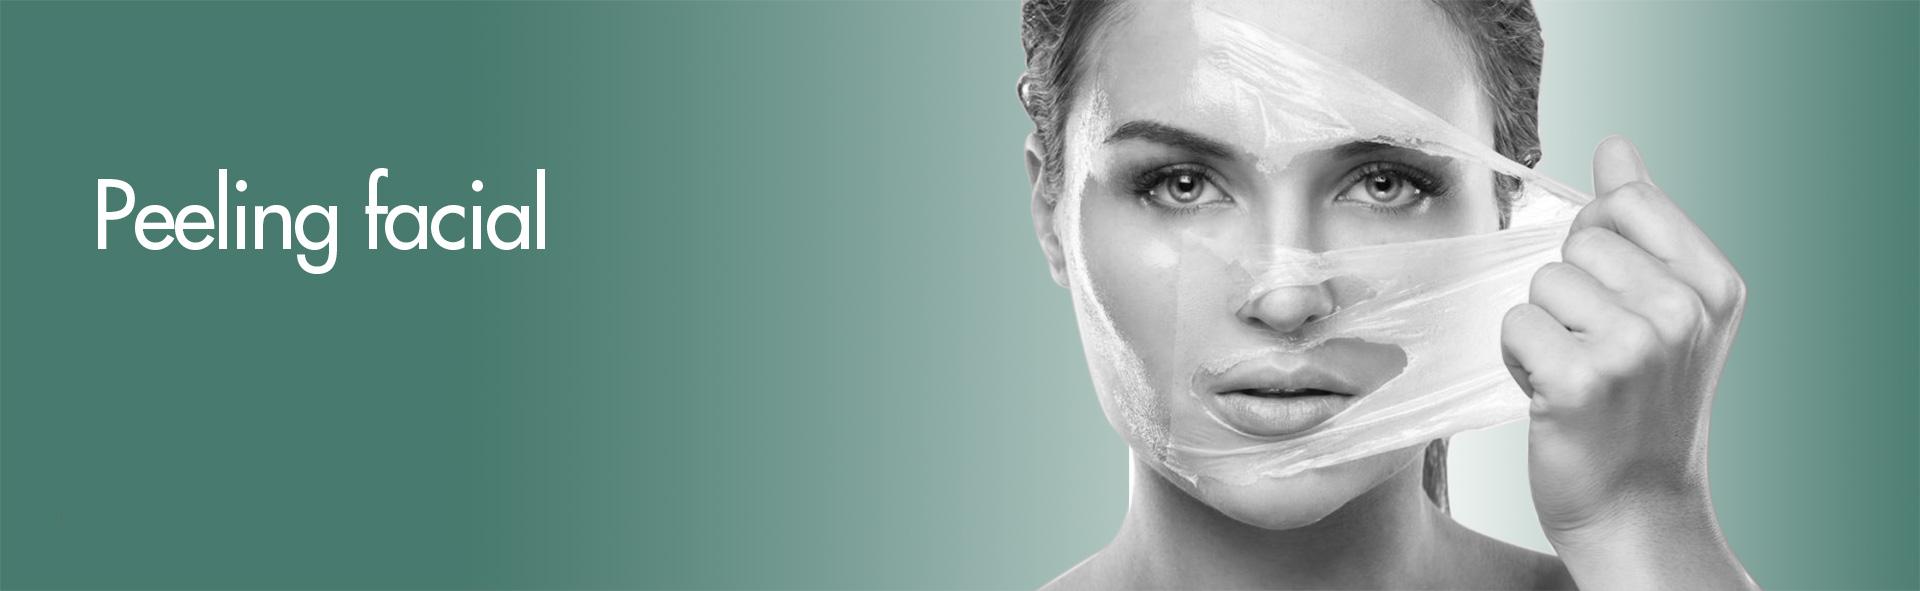 banner peeling facial